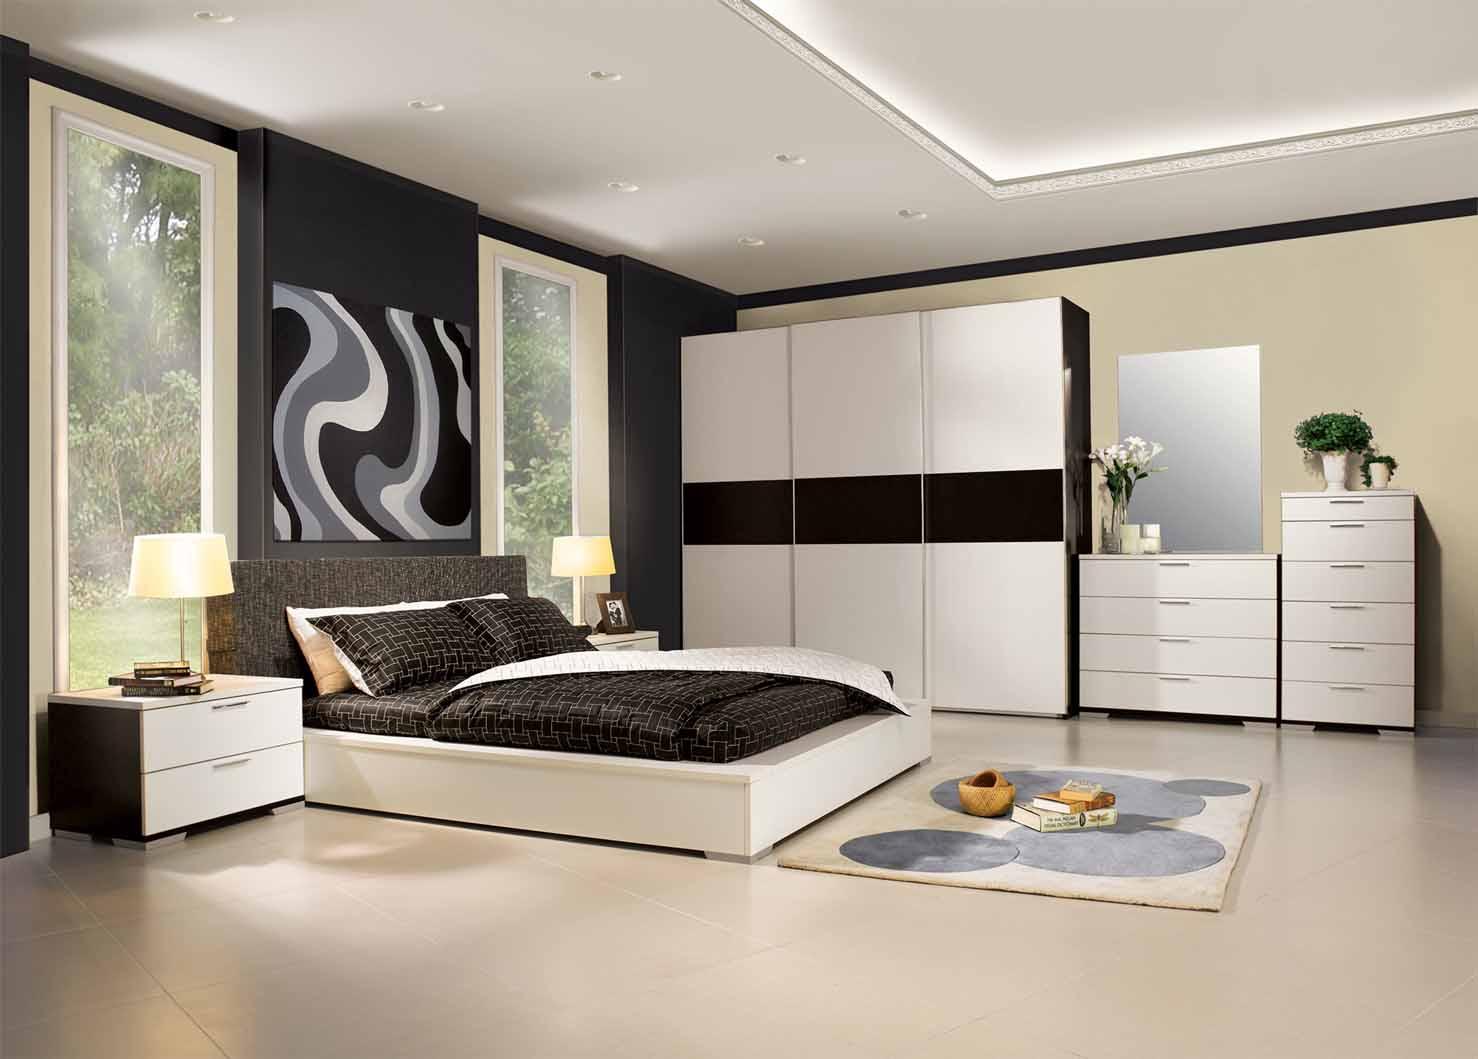 modern-bedroom-decoration-imspirational-ideas